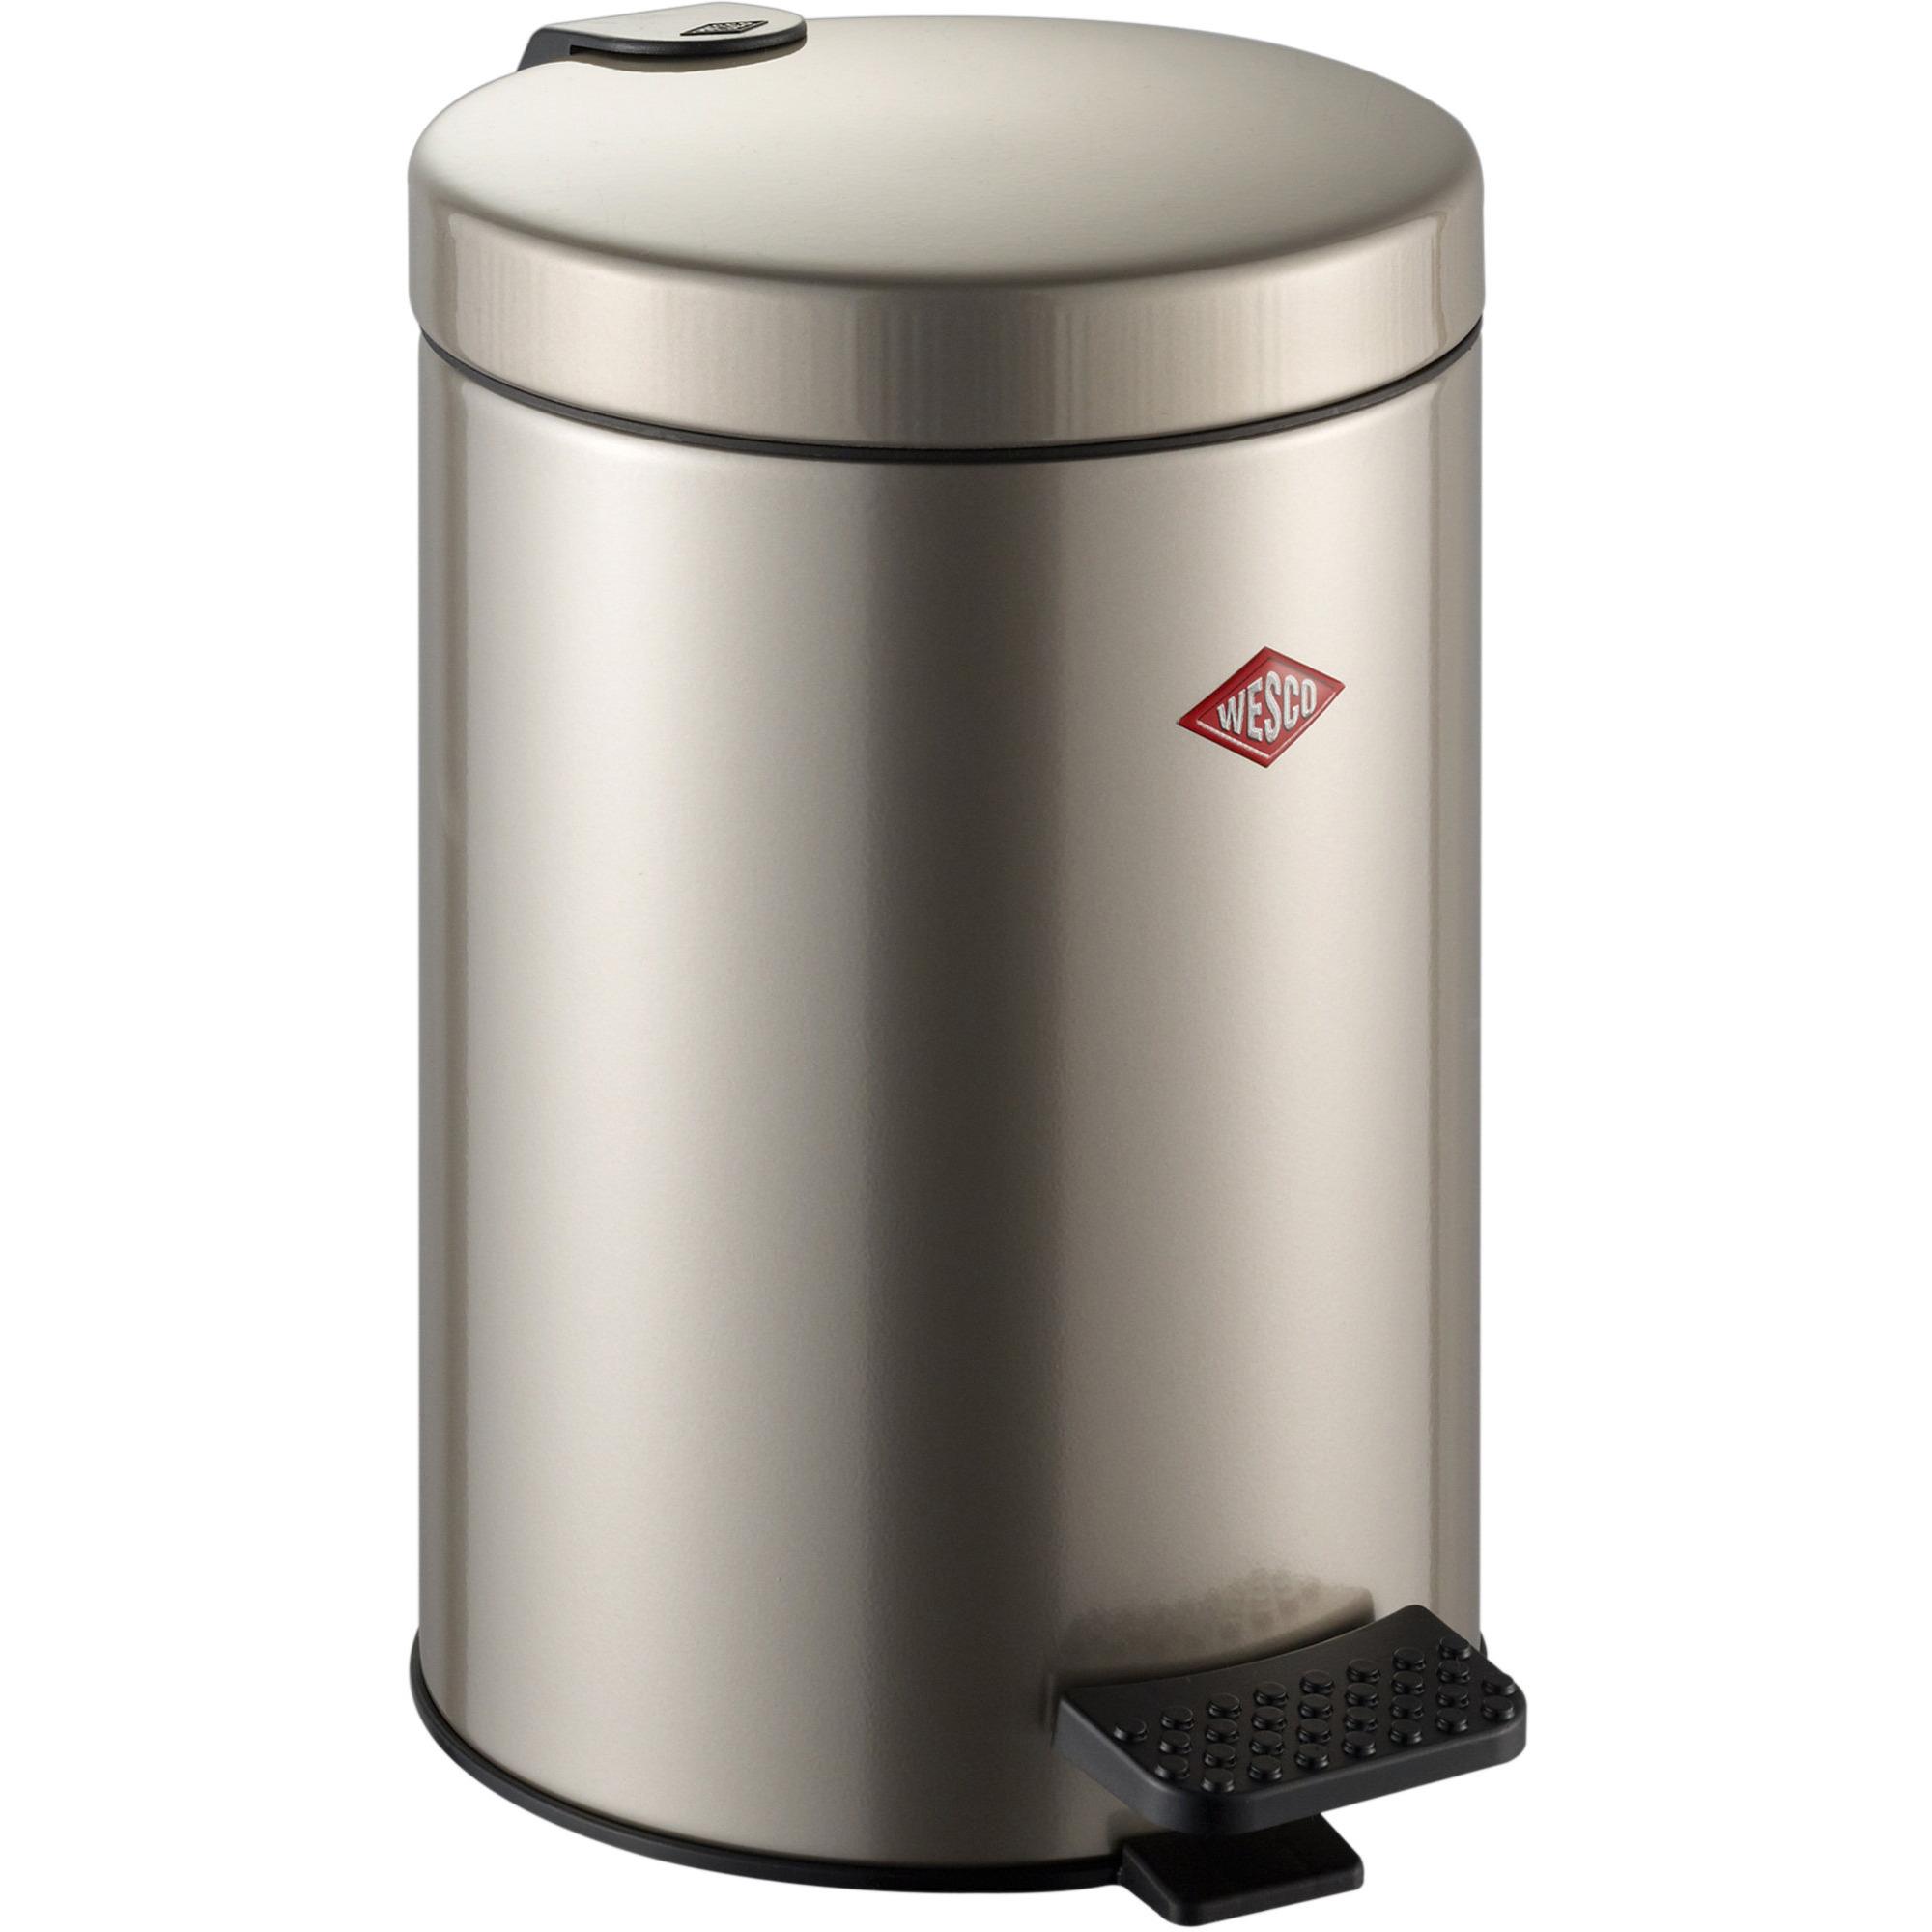 Wesco Pedalhink 104 5 liter – silverfärgad